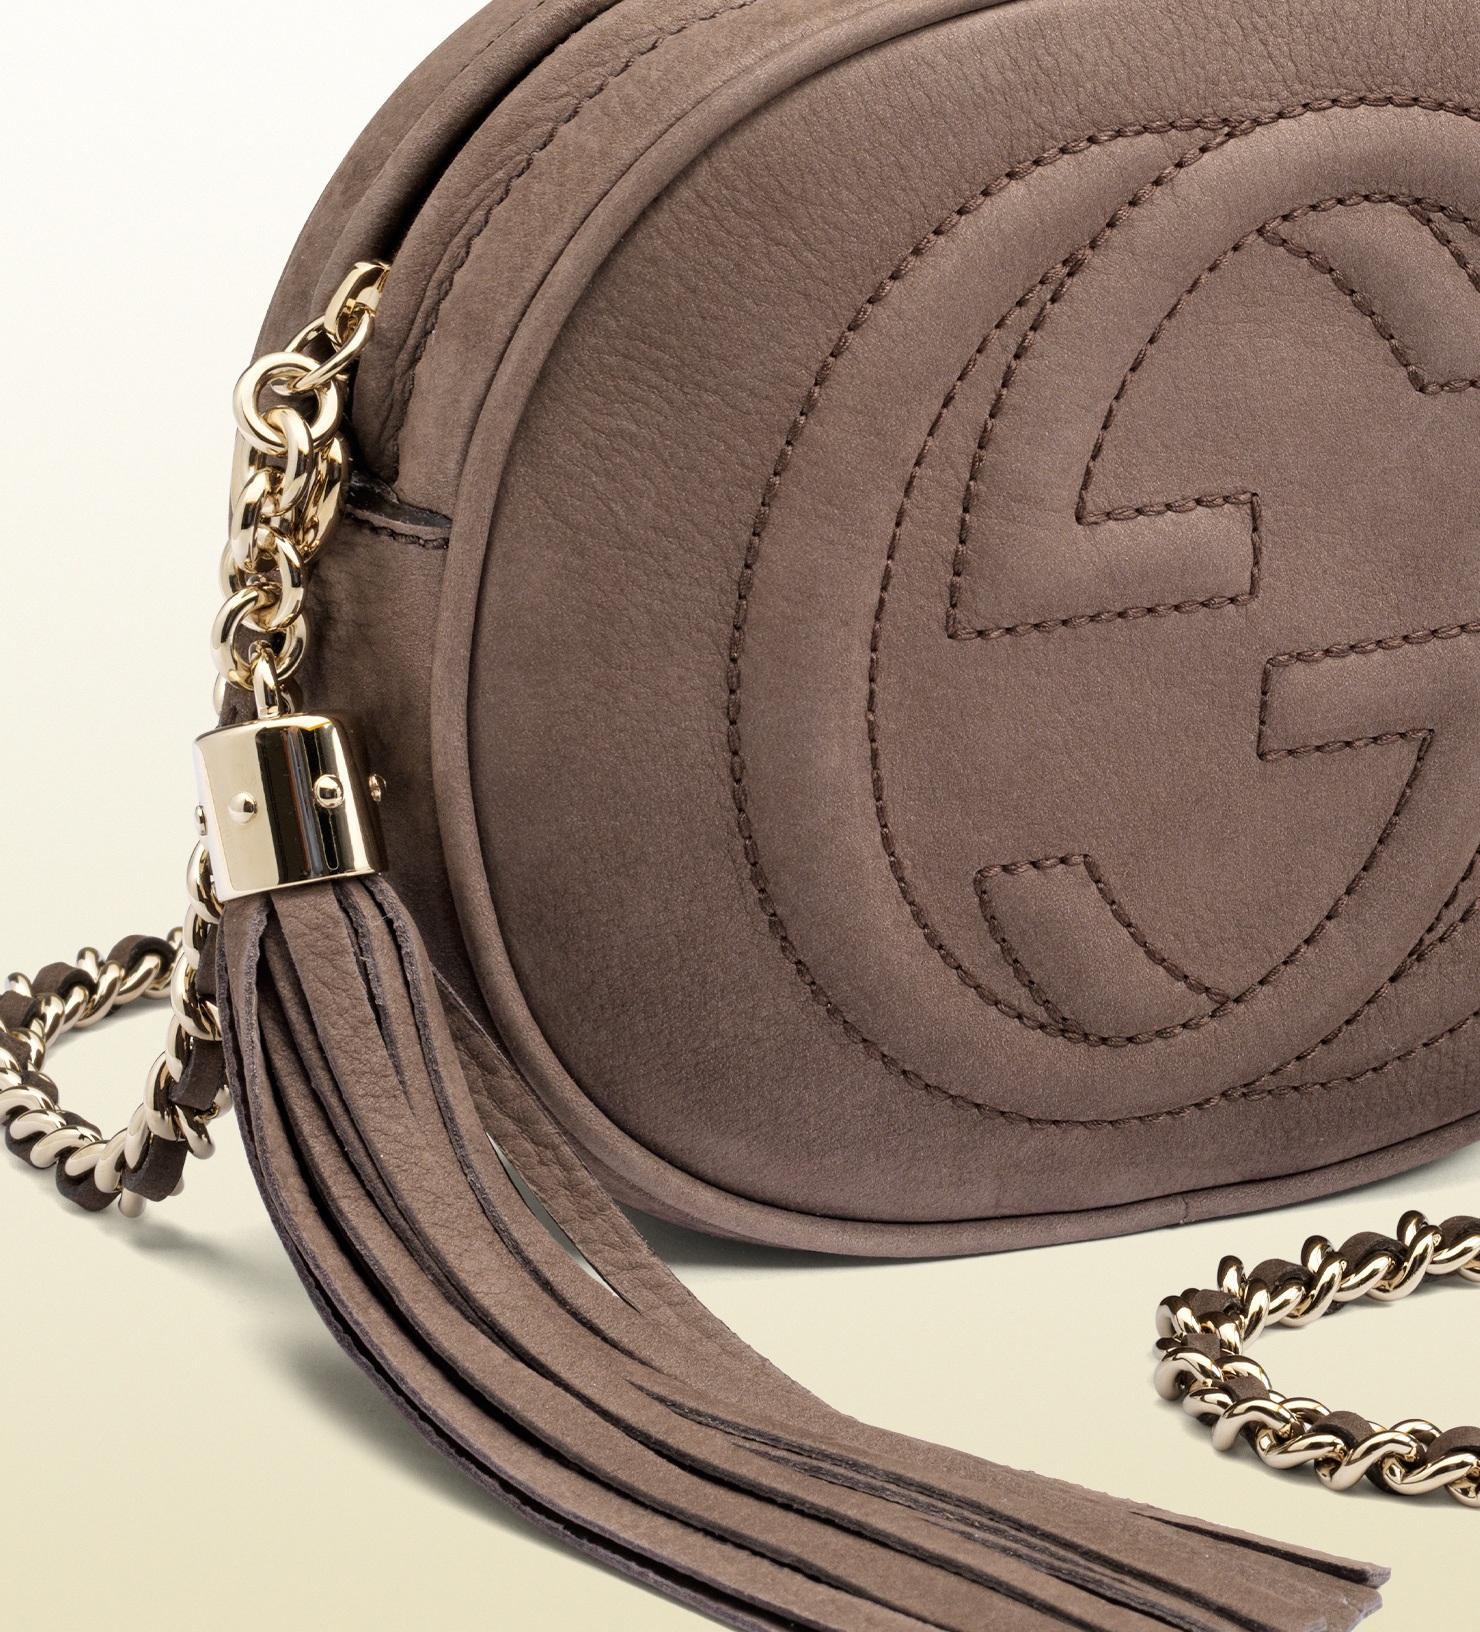 a4fd13d3d04 Gallery. Women s Gucci Soho Bag Women s Black Patent Leather ...